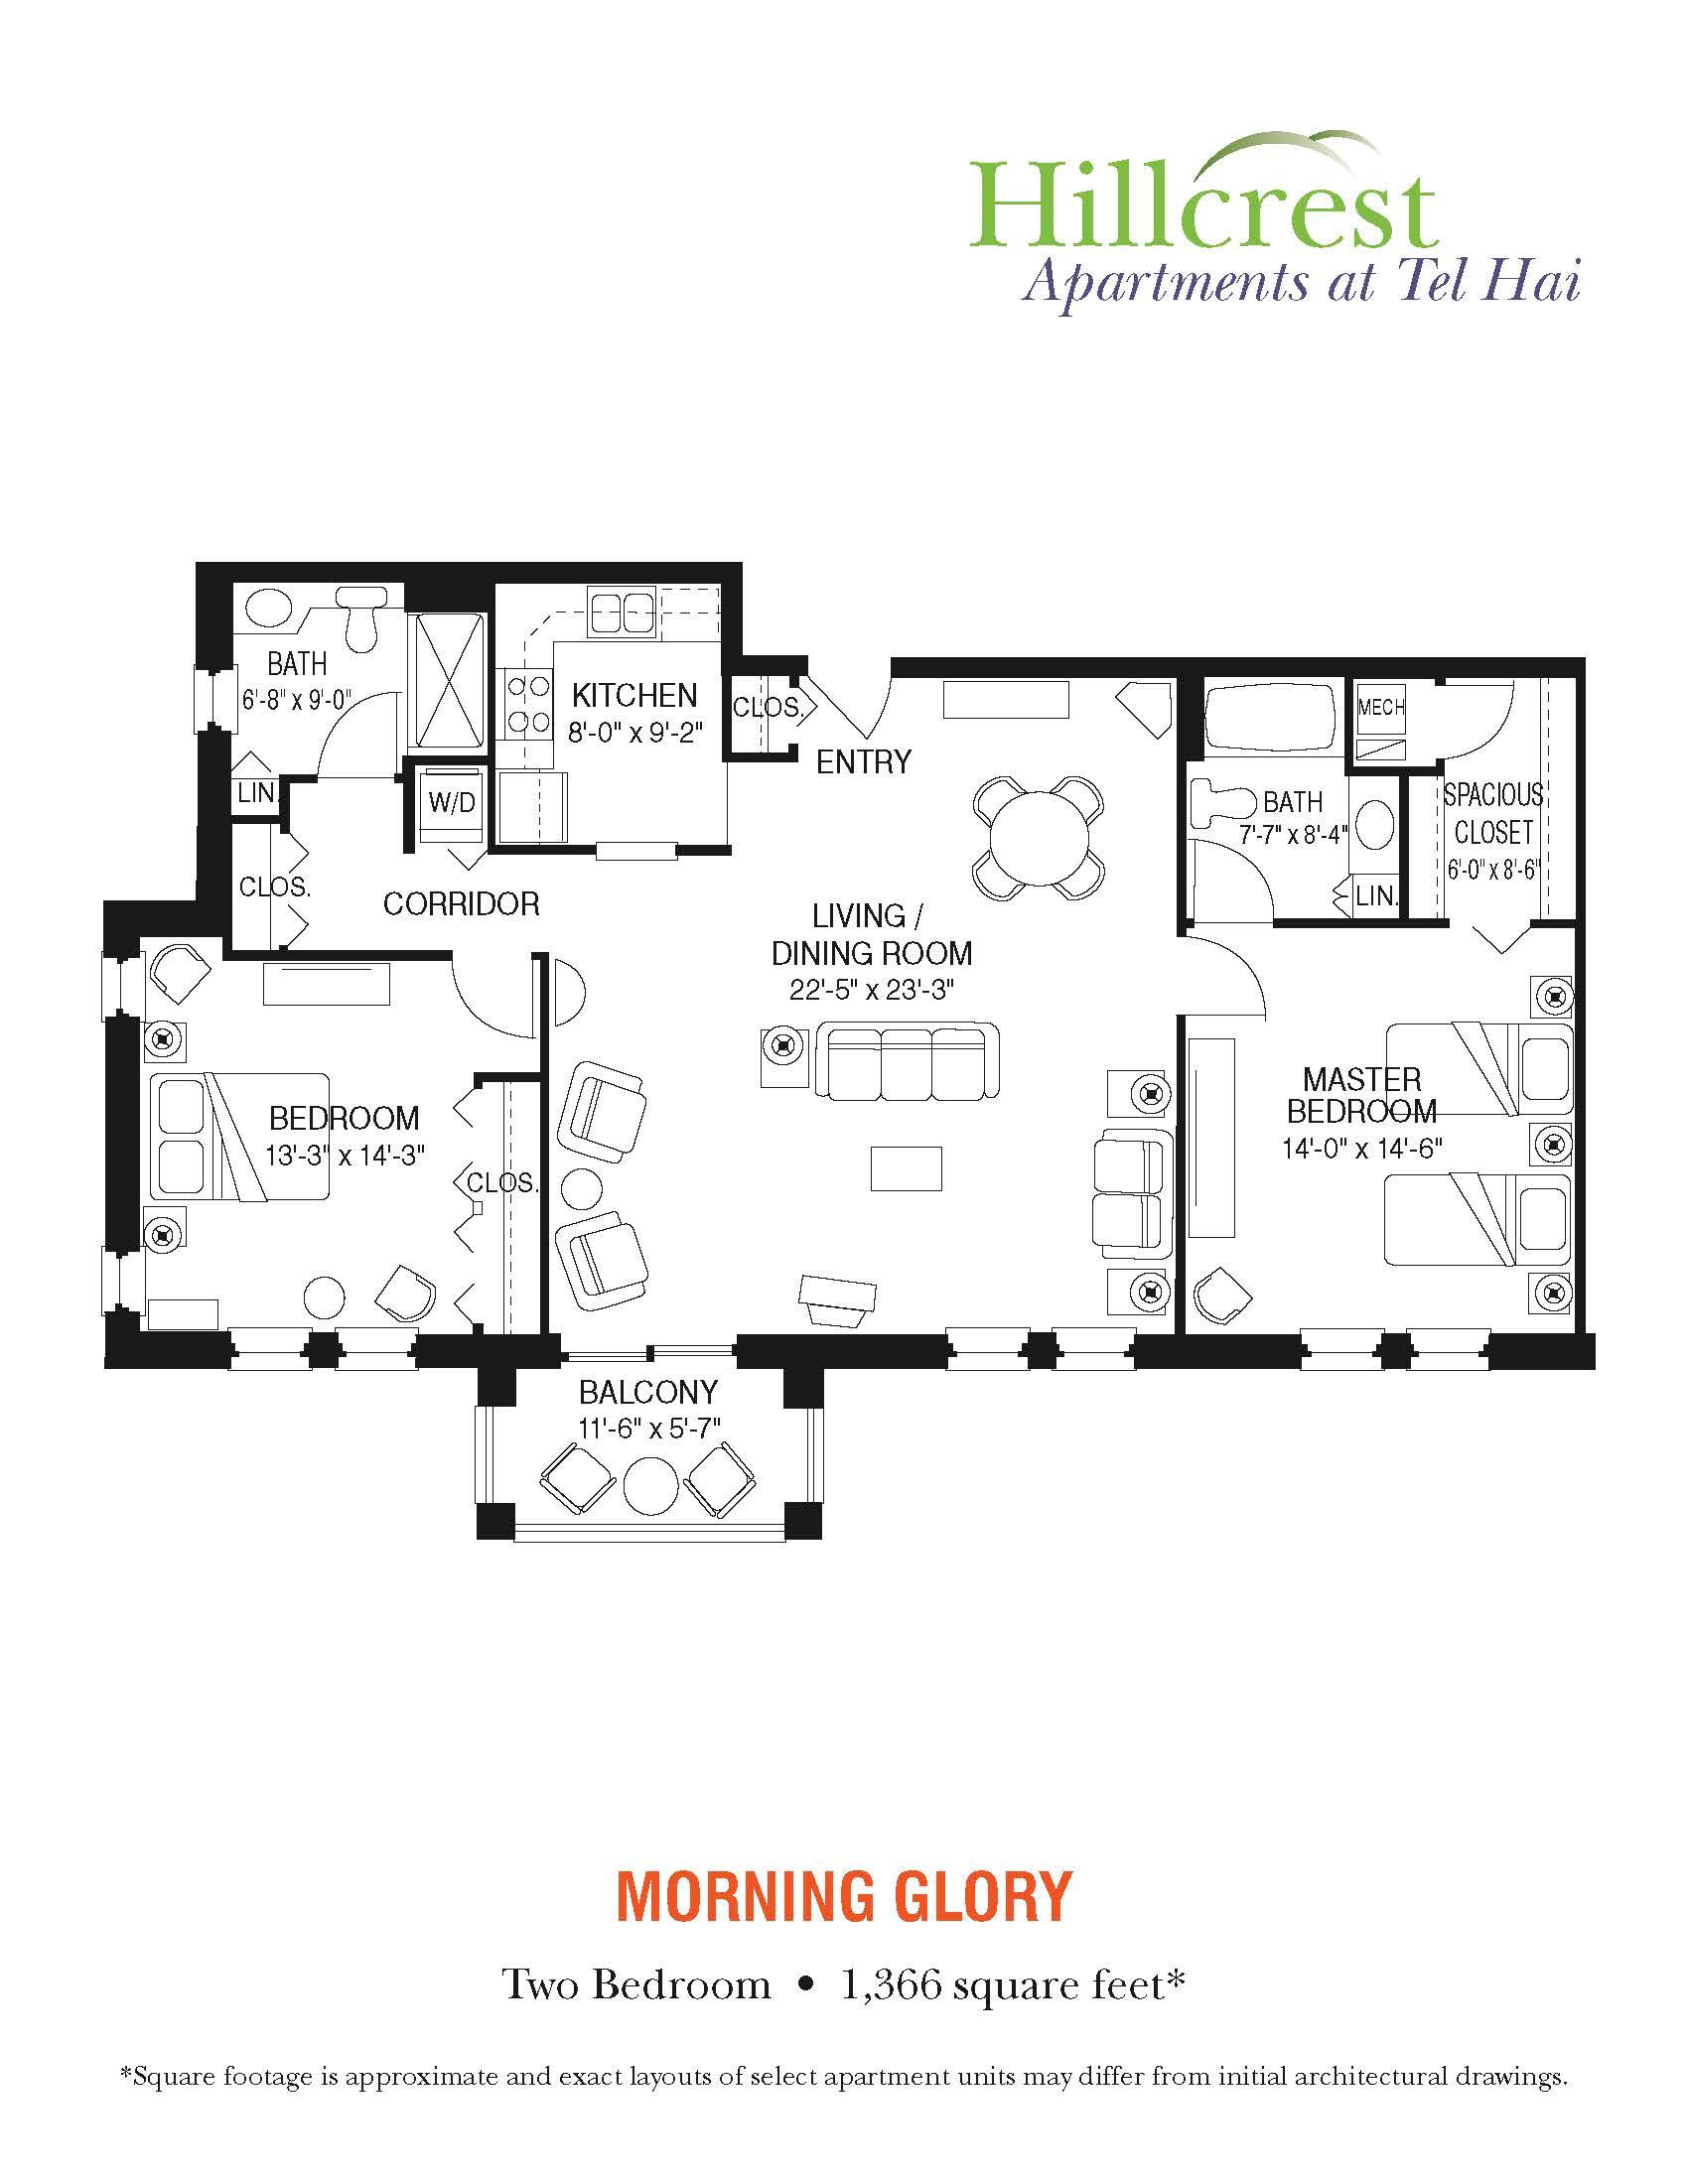 Morning Glory Apartment at Tel Hai